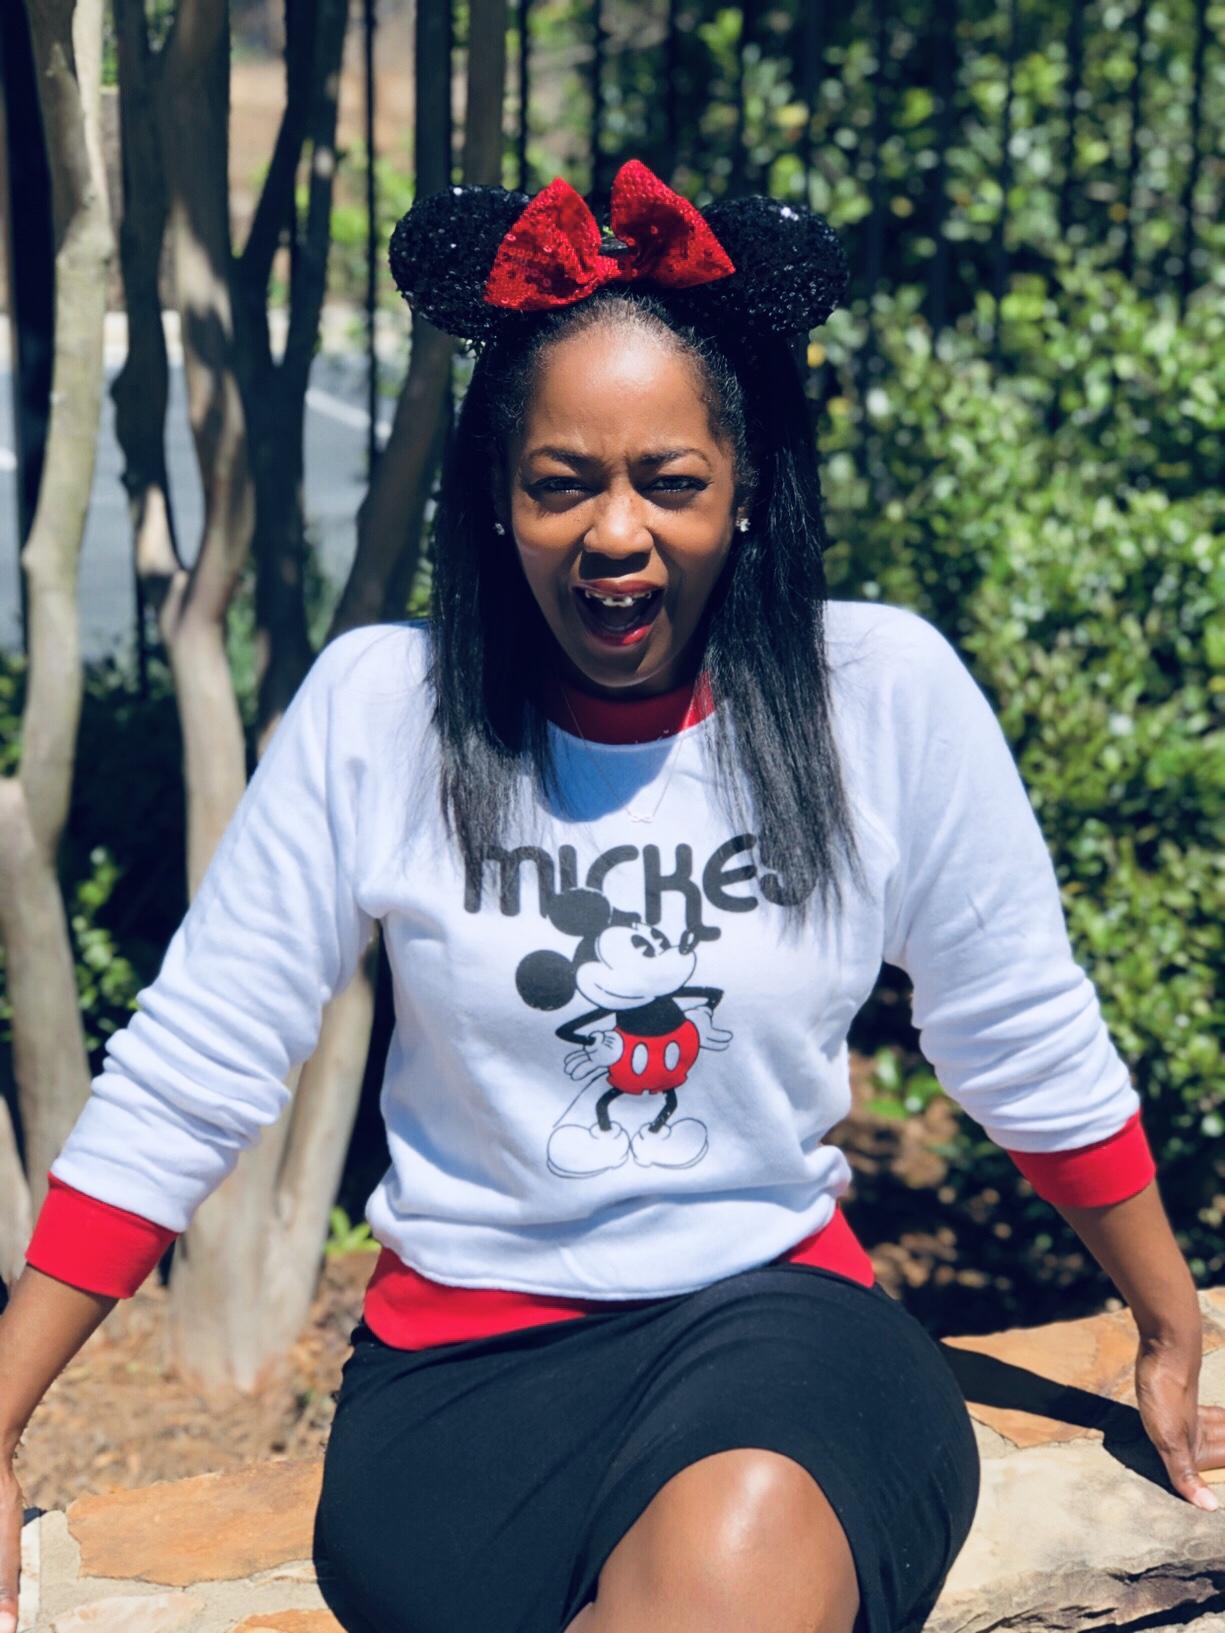 My Style: Mickey Mouse Sweatshirt